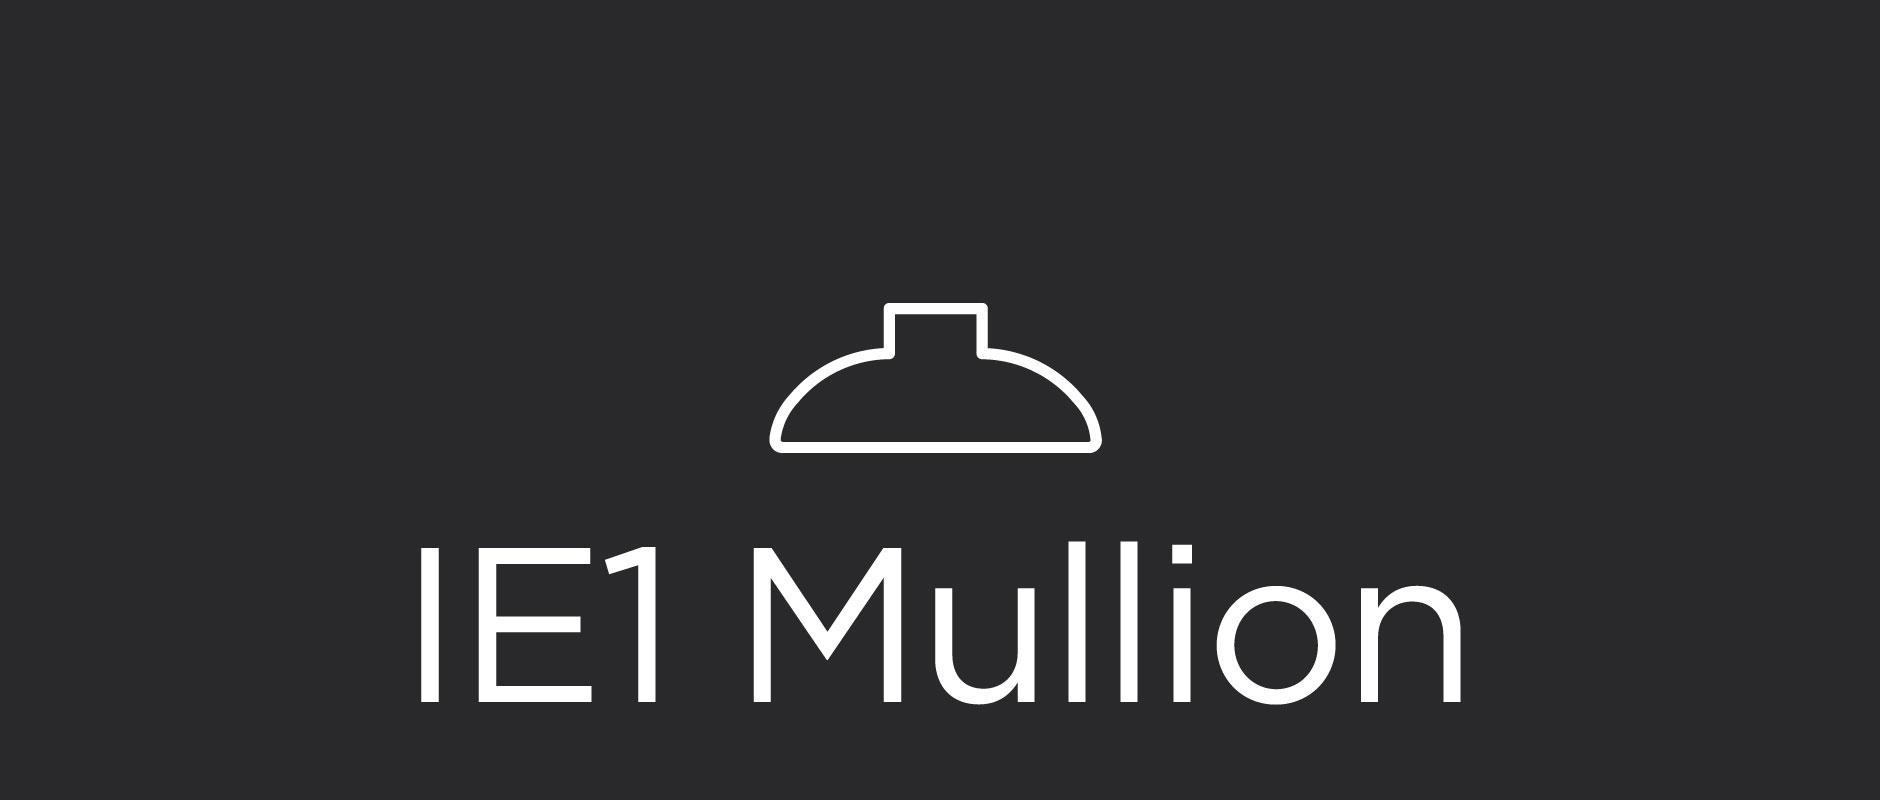 IE1 mullion for divided lite cabinet doors